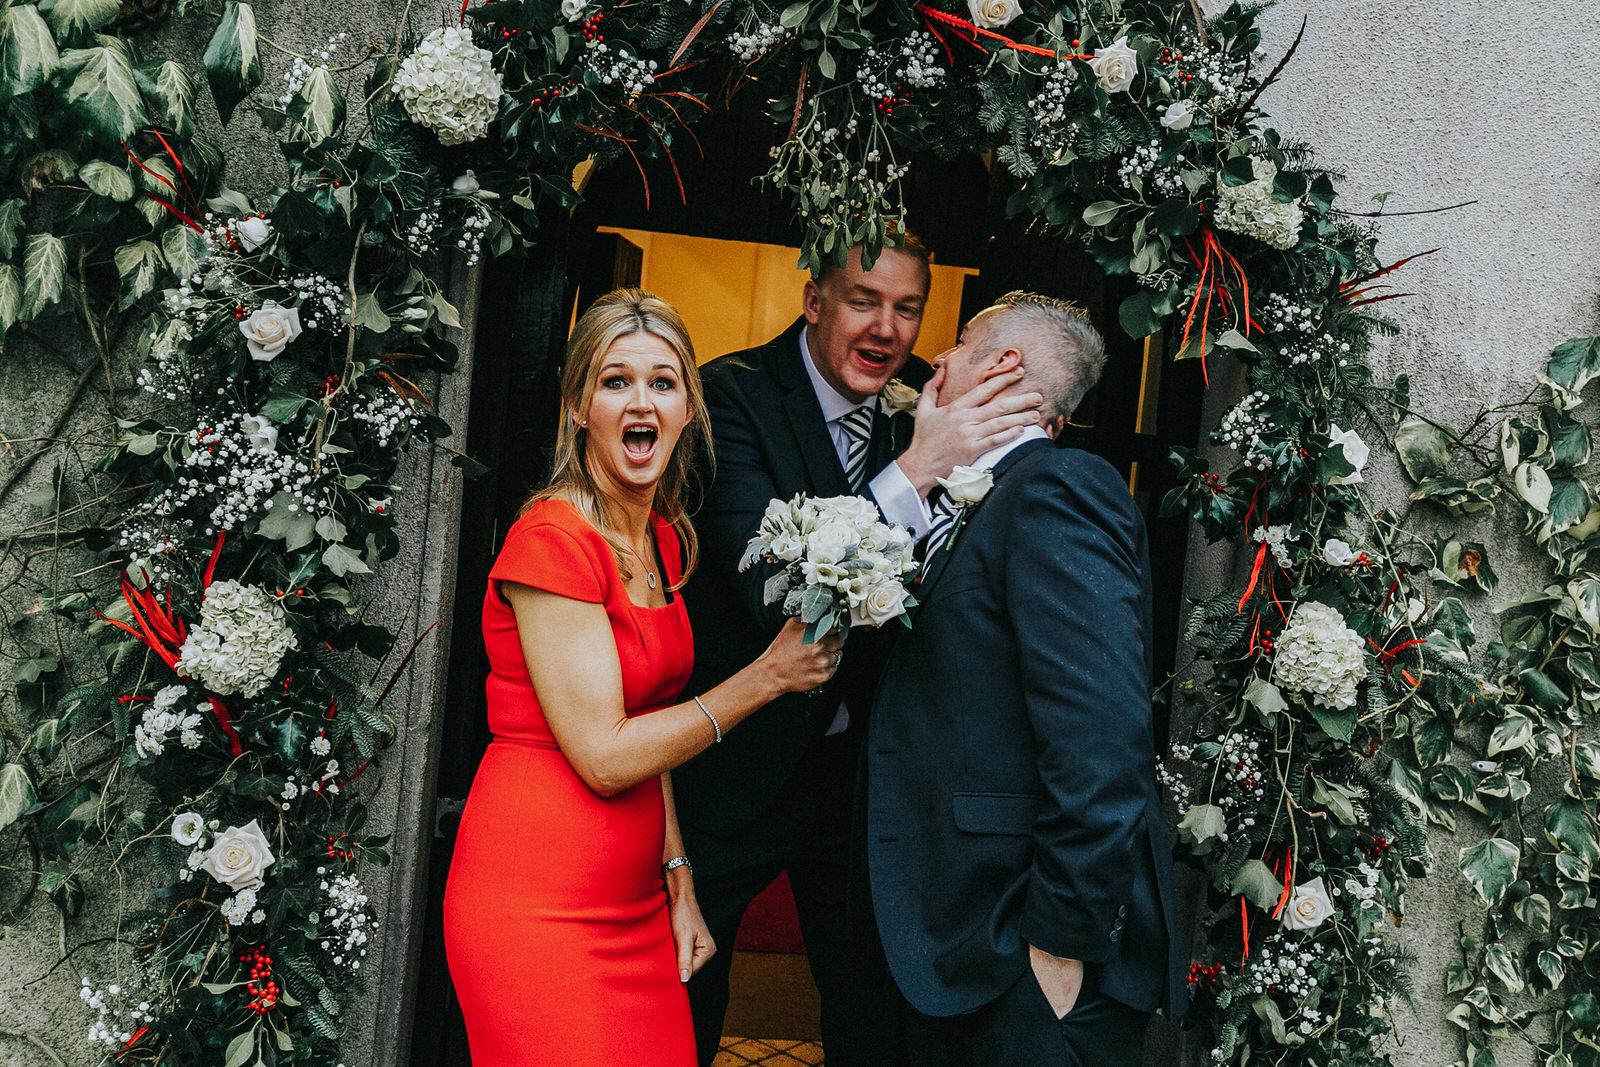 Roger_Kenny_wedding_photographer_Brooklodge__672.jpg